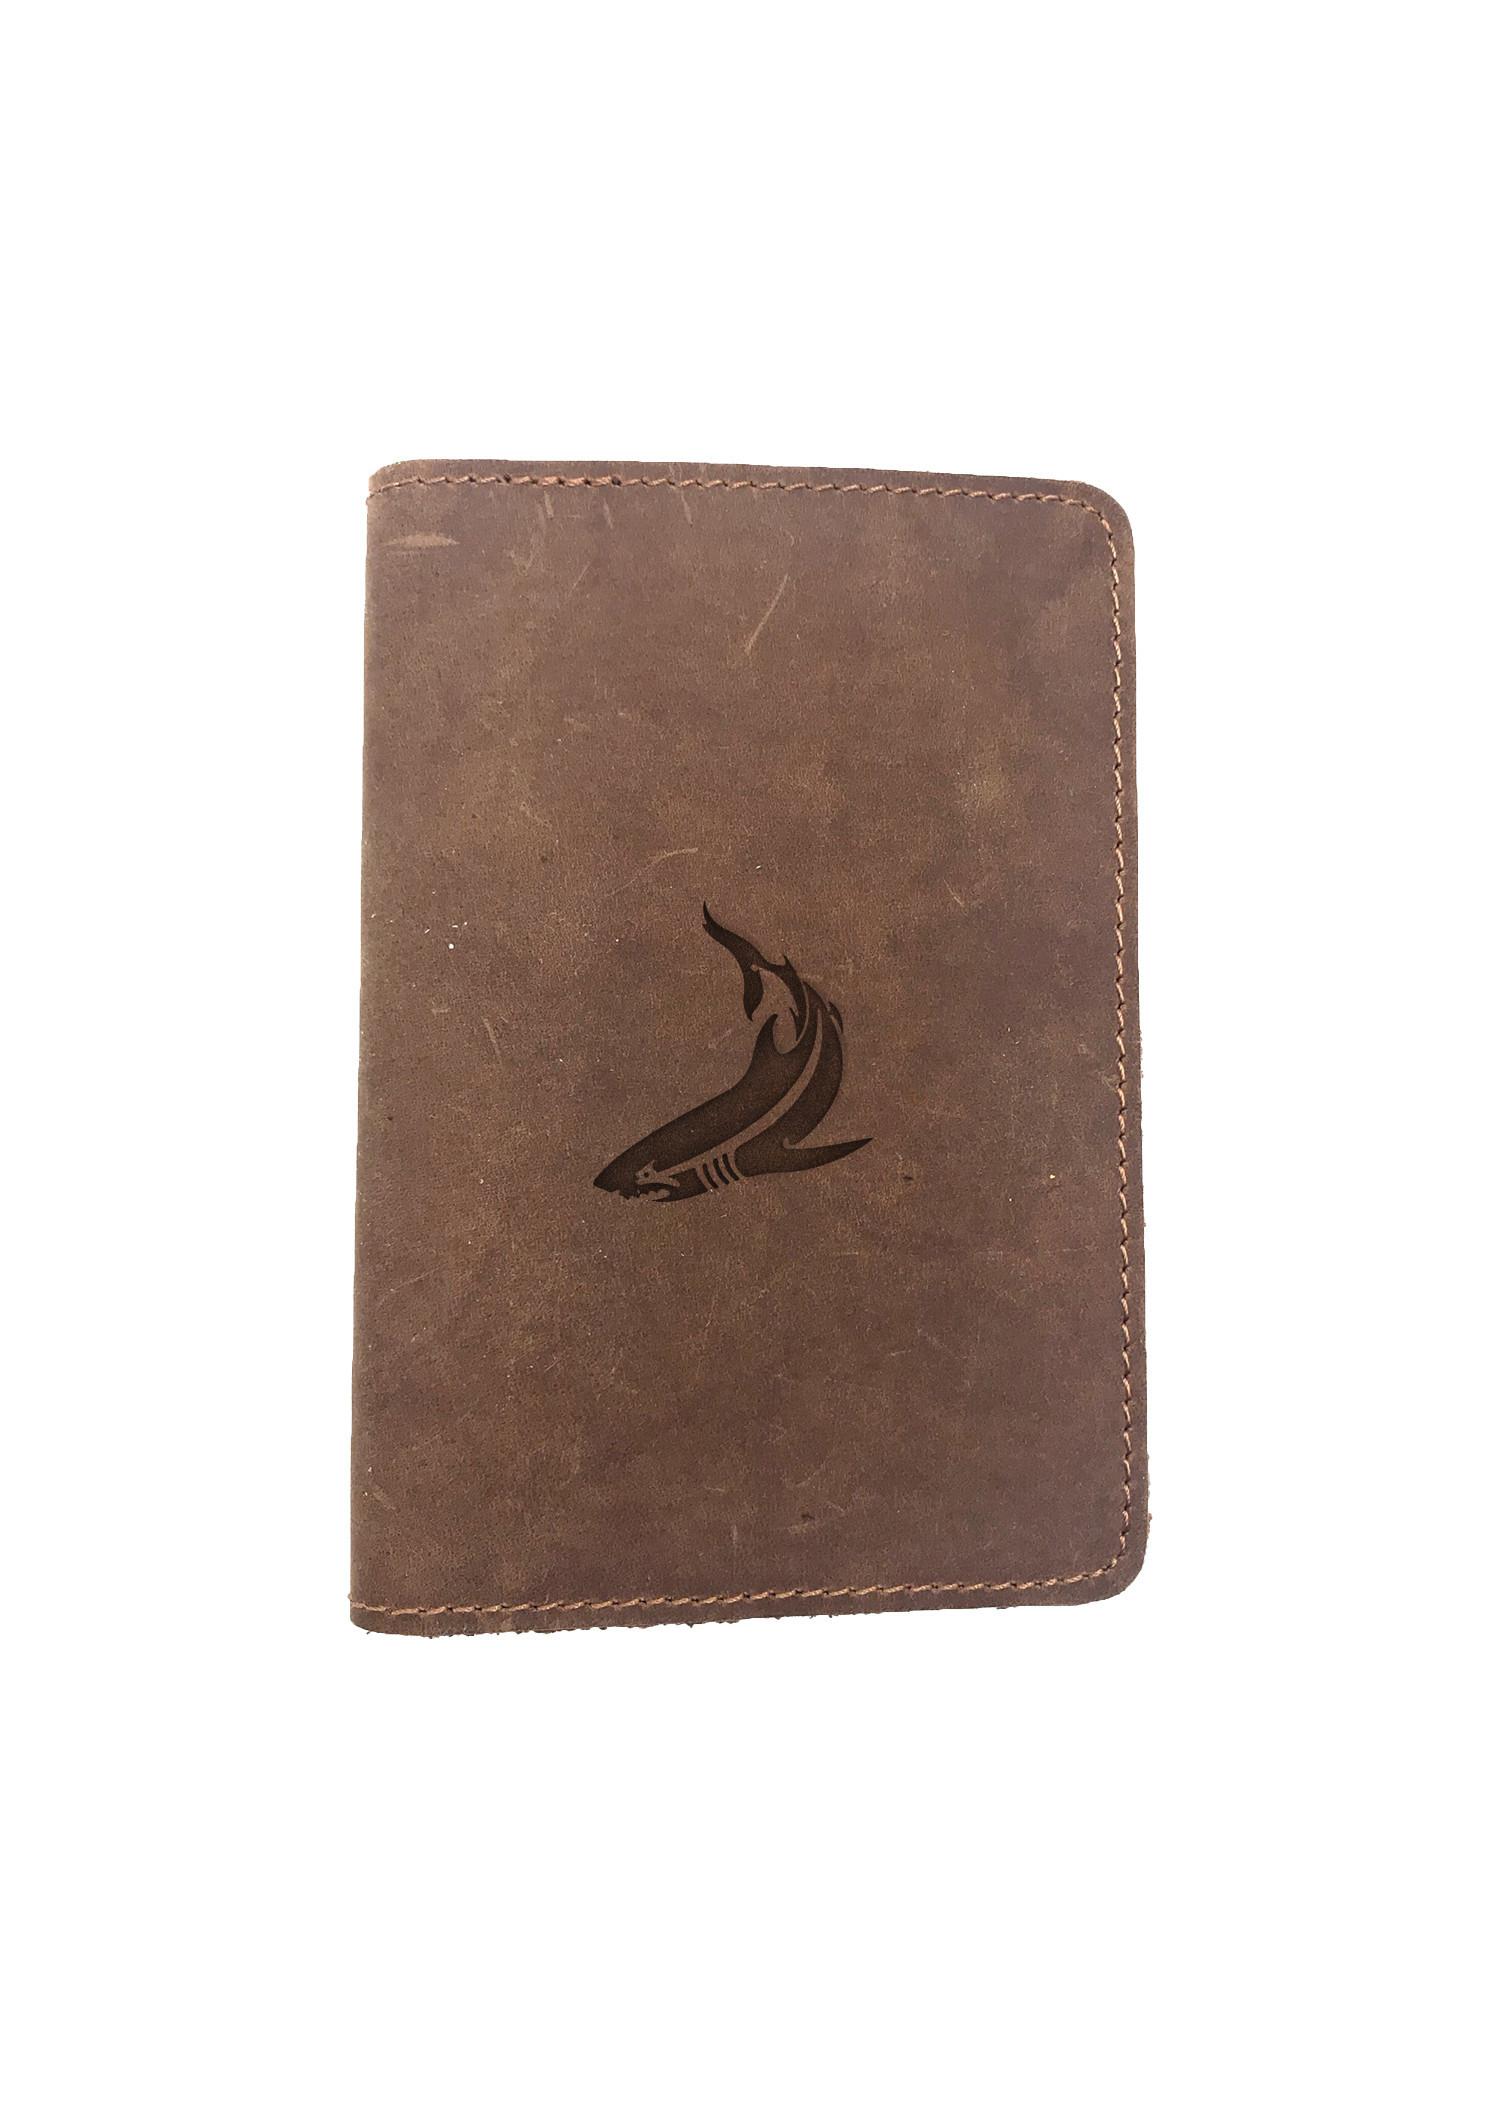 Passport Cover Bao Da Hộ Chiếu Da Sáp Khắc Hình Cá mập SHARK STENCIL ART (BROWN)